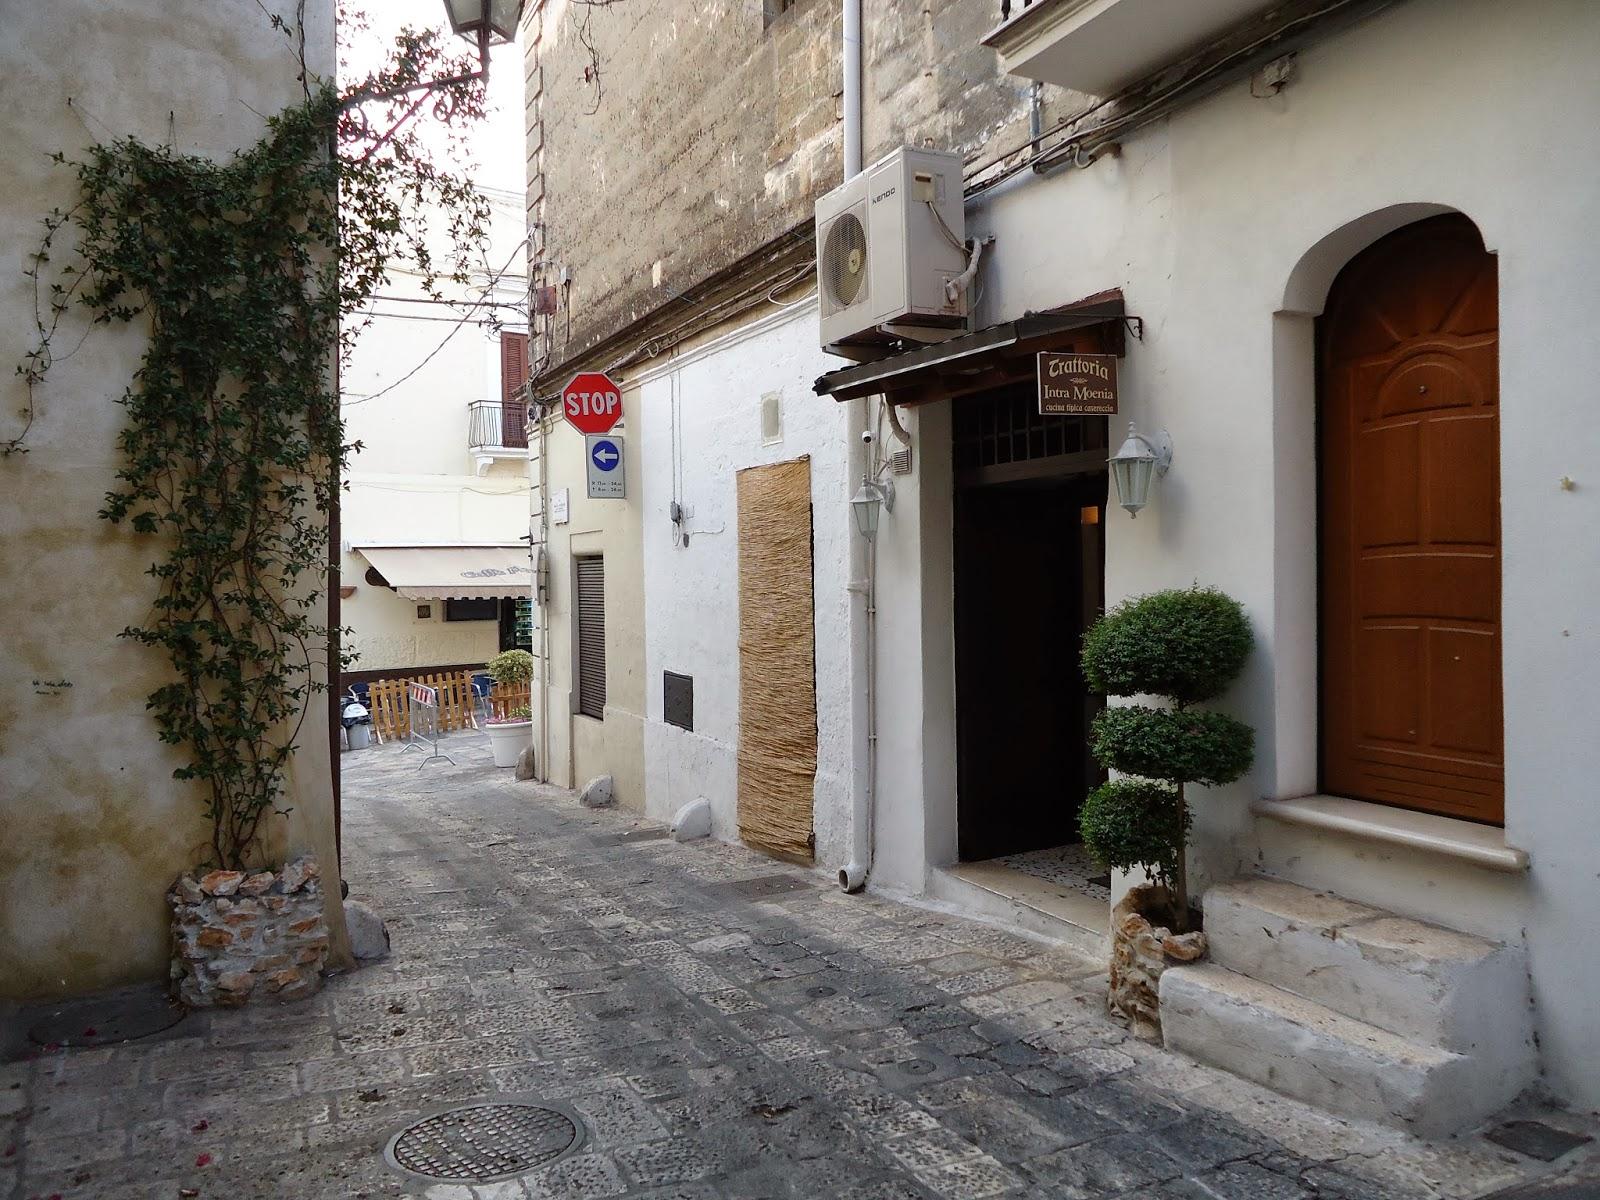 http://www.trattoriaintramoenia.com/